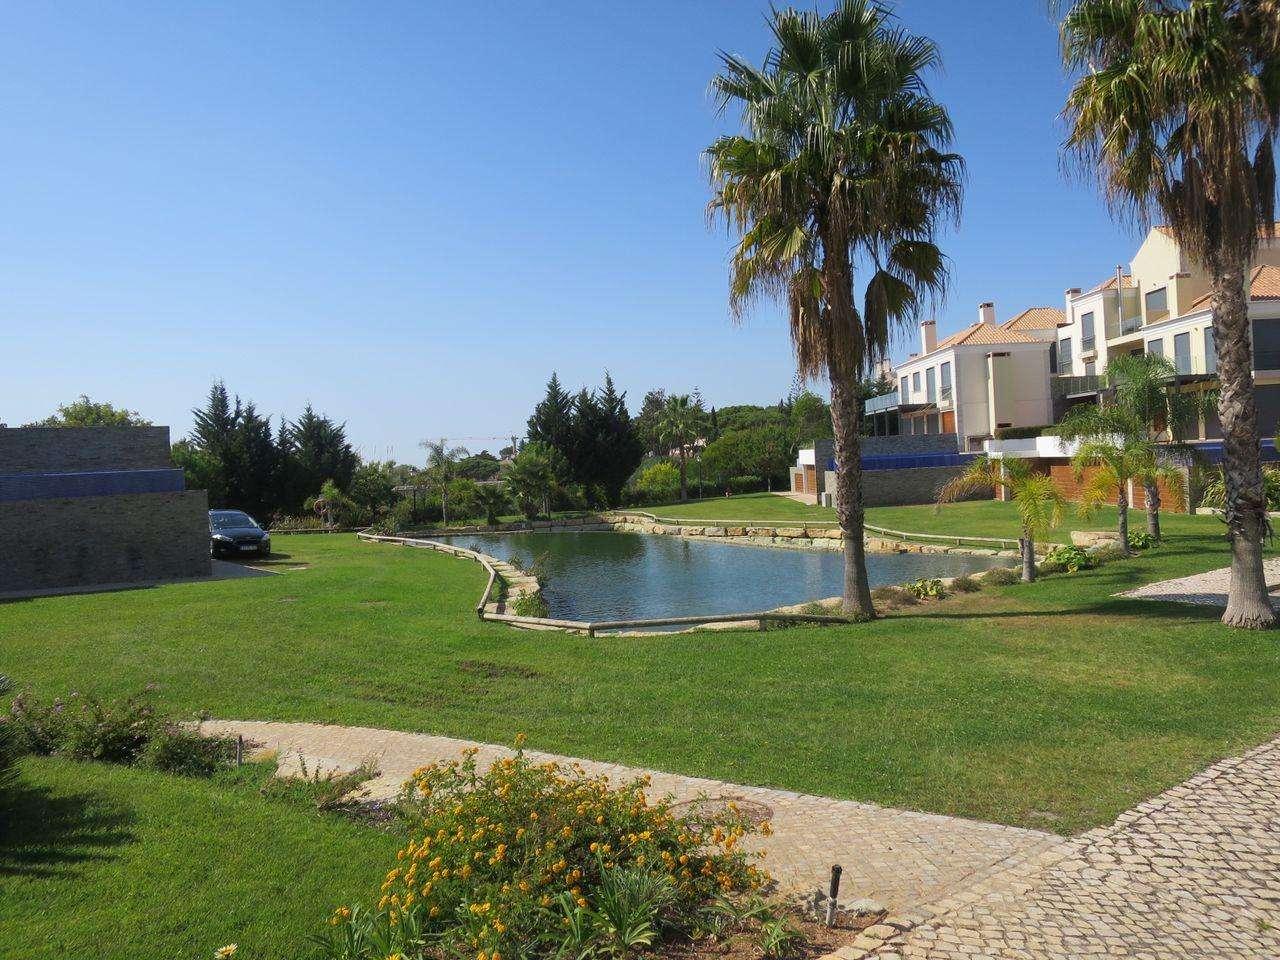 Apartamento para comprar, Almancil, Faro - Foto 8